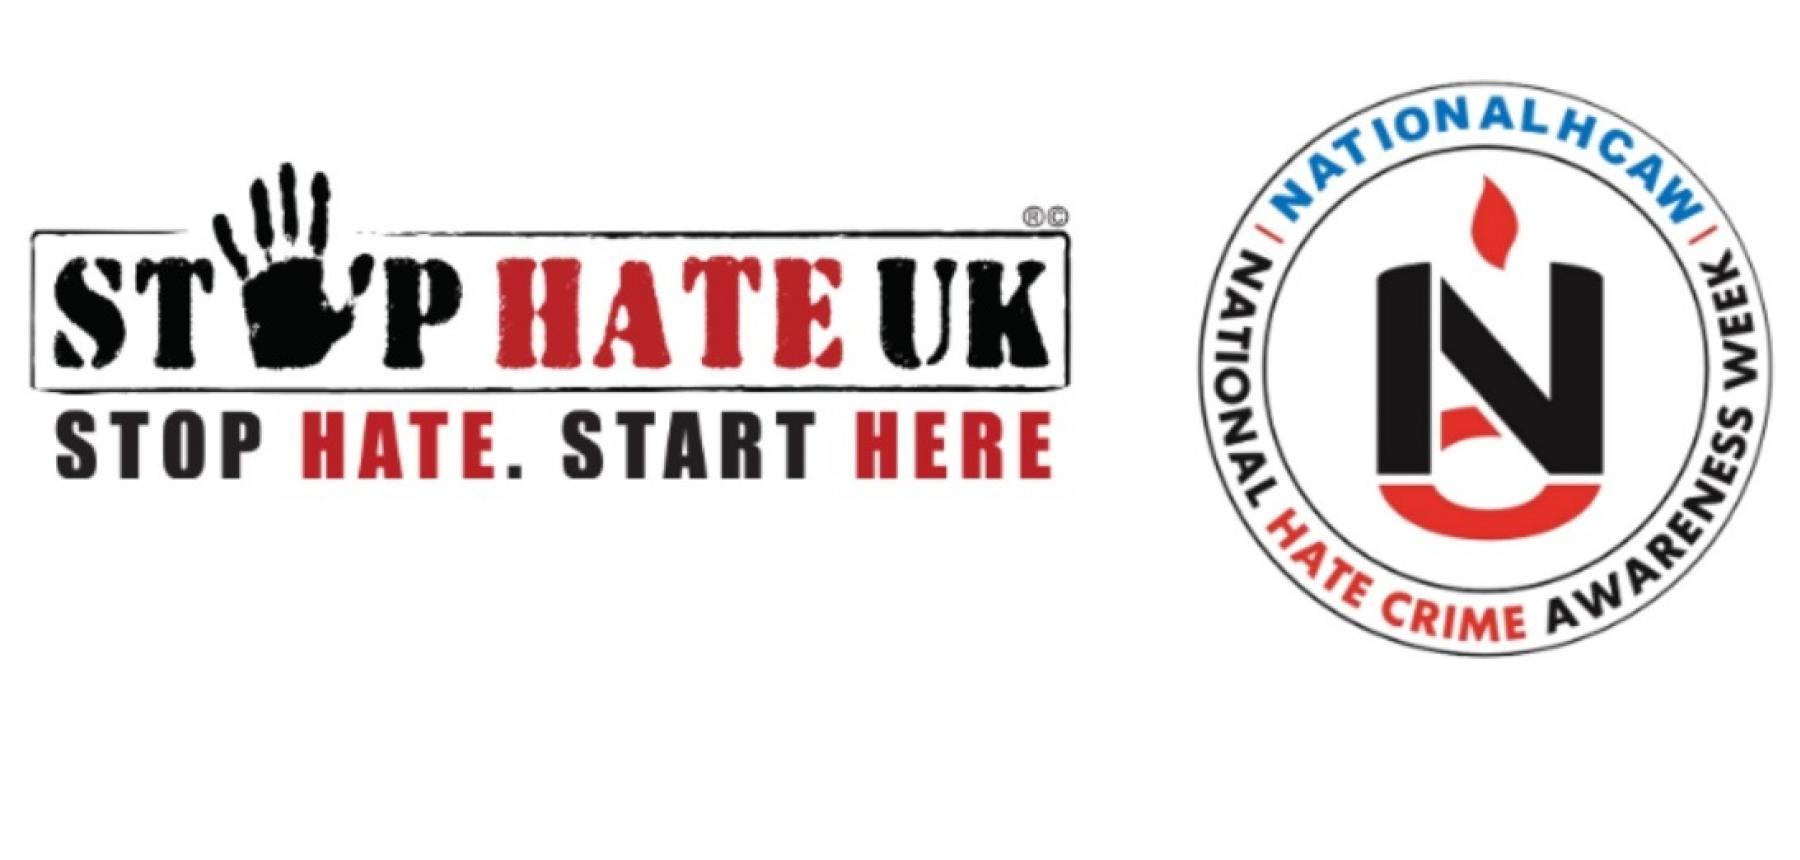 National Hate Crime Awareness Week 2020